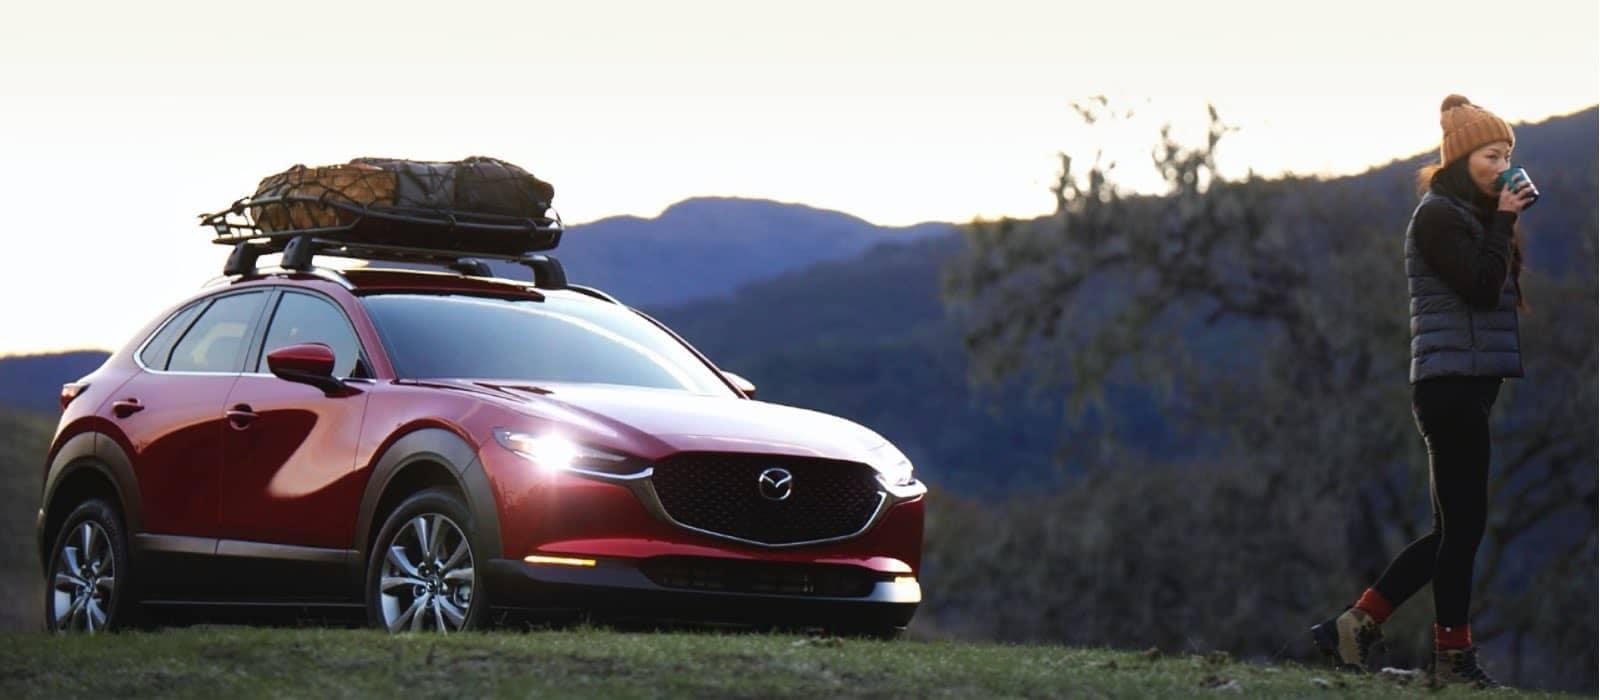 2021 Mazda3 hatchback with full cargo rack